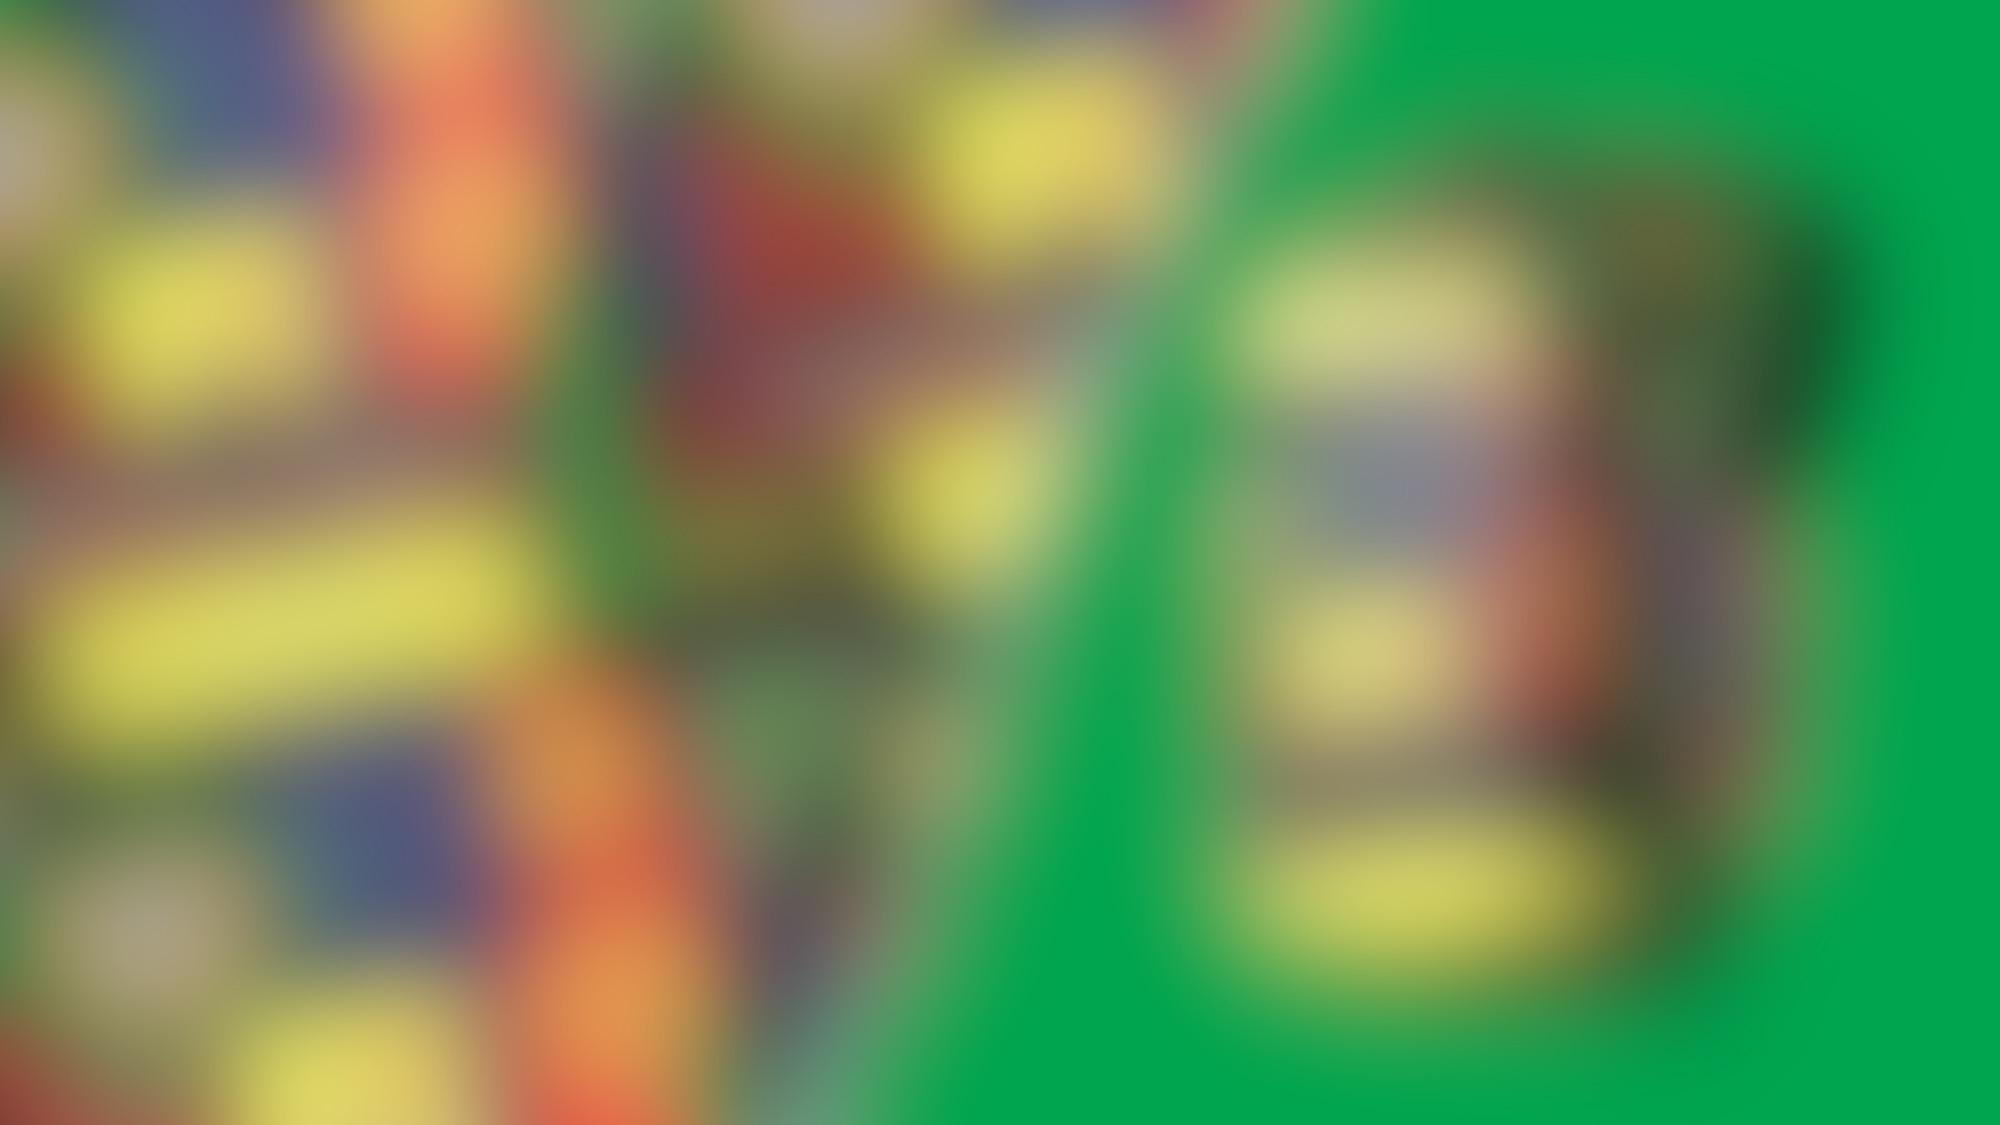 MTV STYLEGUIDE 5 autocompressfitresizeixlibphp 1 1 0max h2000max w3 D2000q80sfa8c464fab2247fe9278f898706eb470